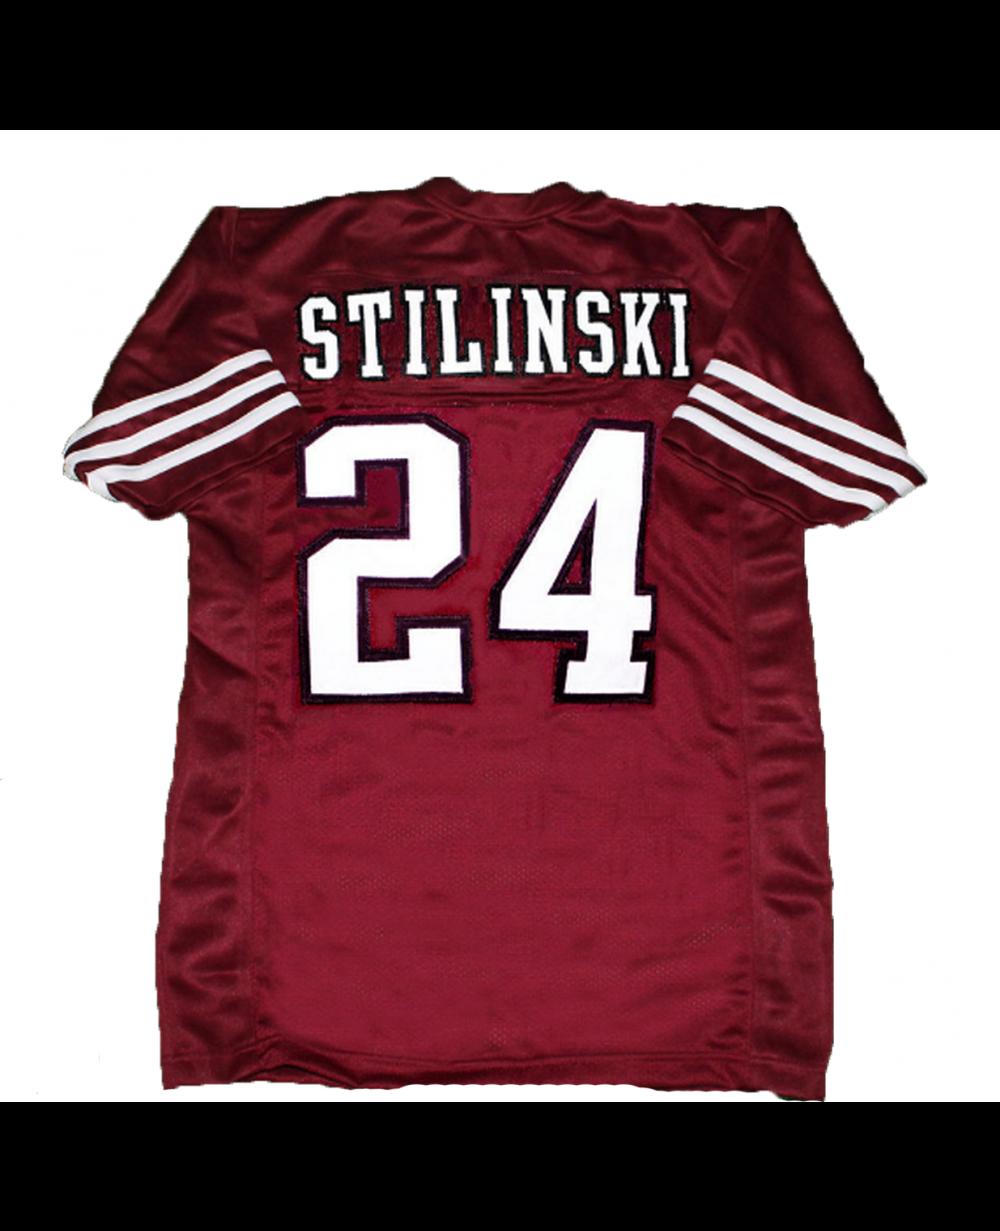 Stiles Stilinski #24 Beacon Hills Lacrosse Jersey.